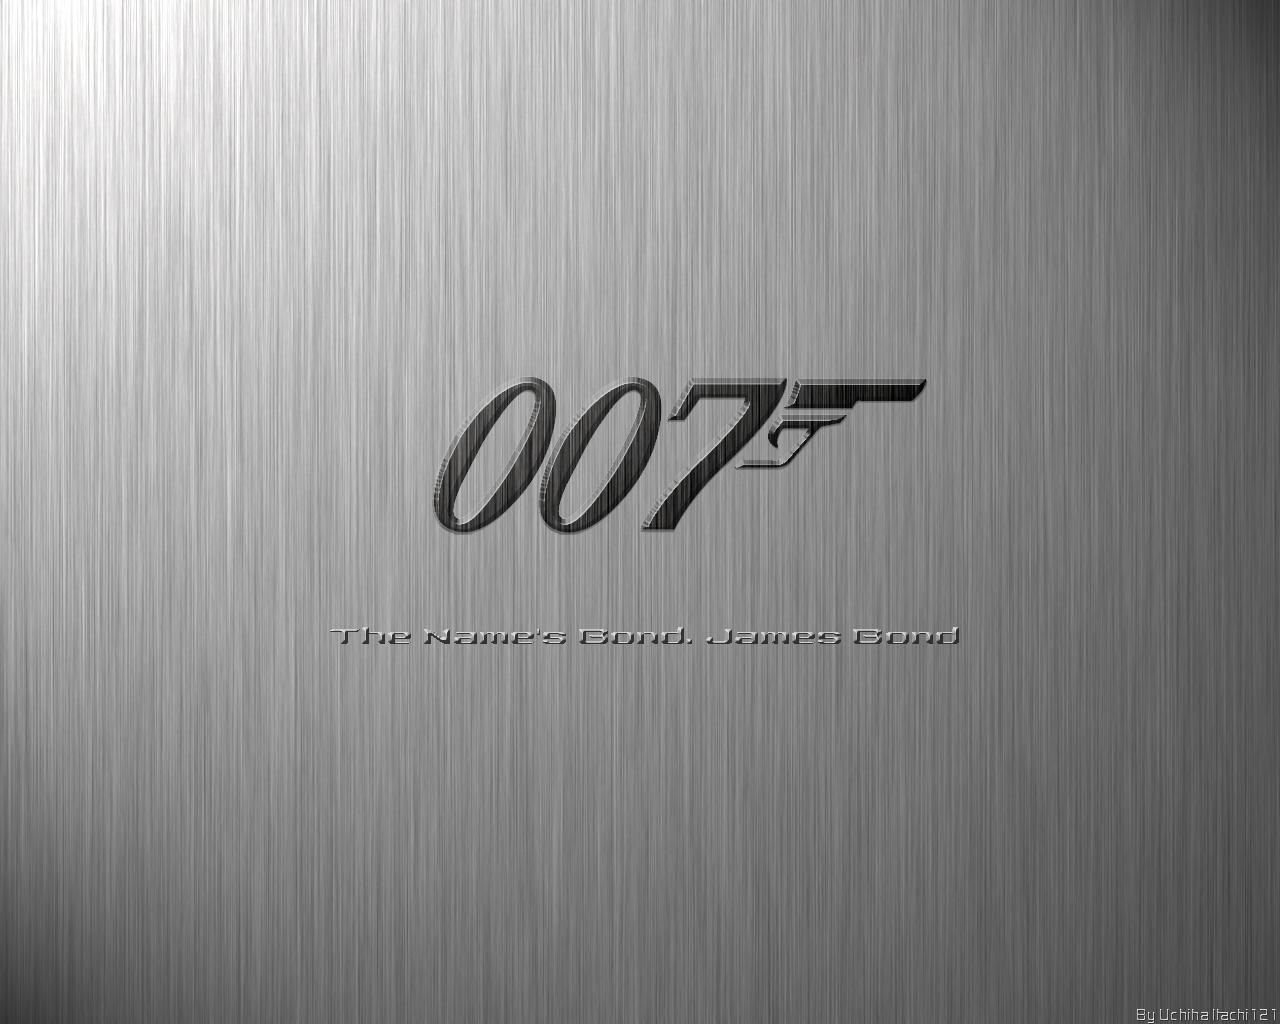 007 Logo Wallpaper